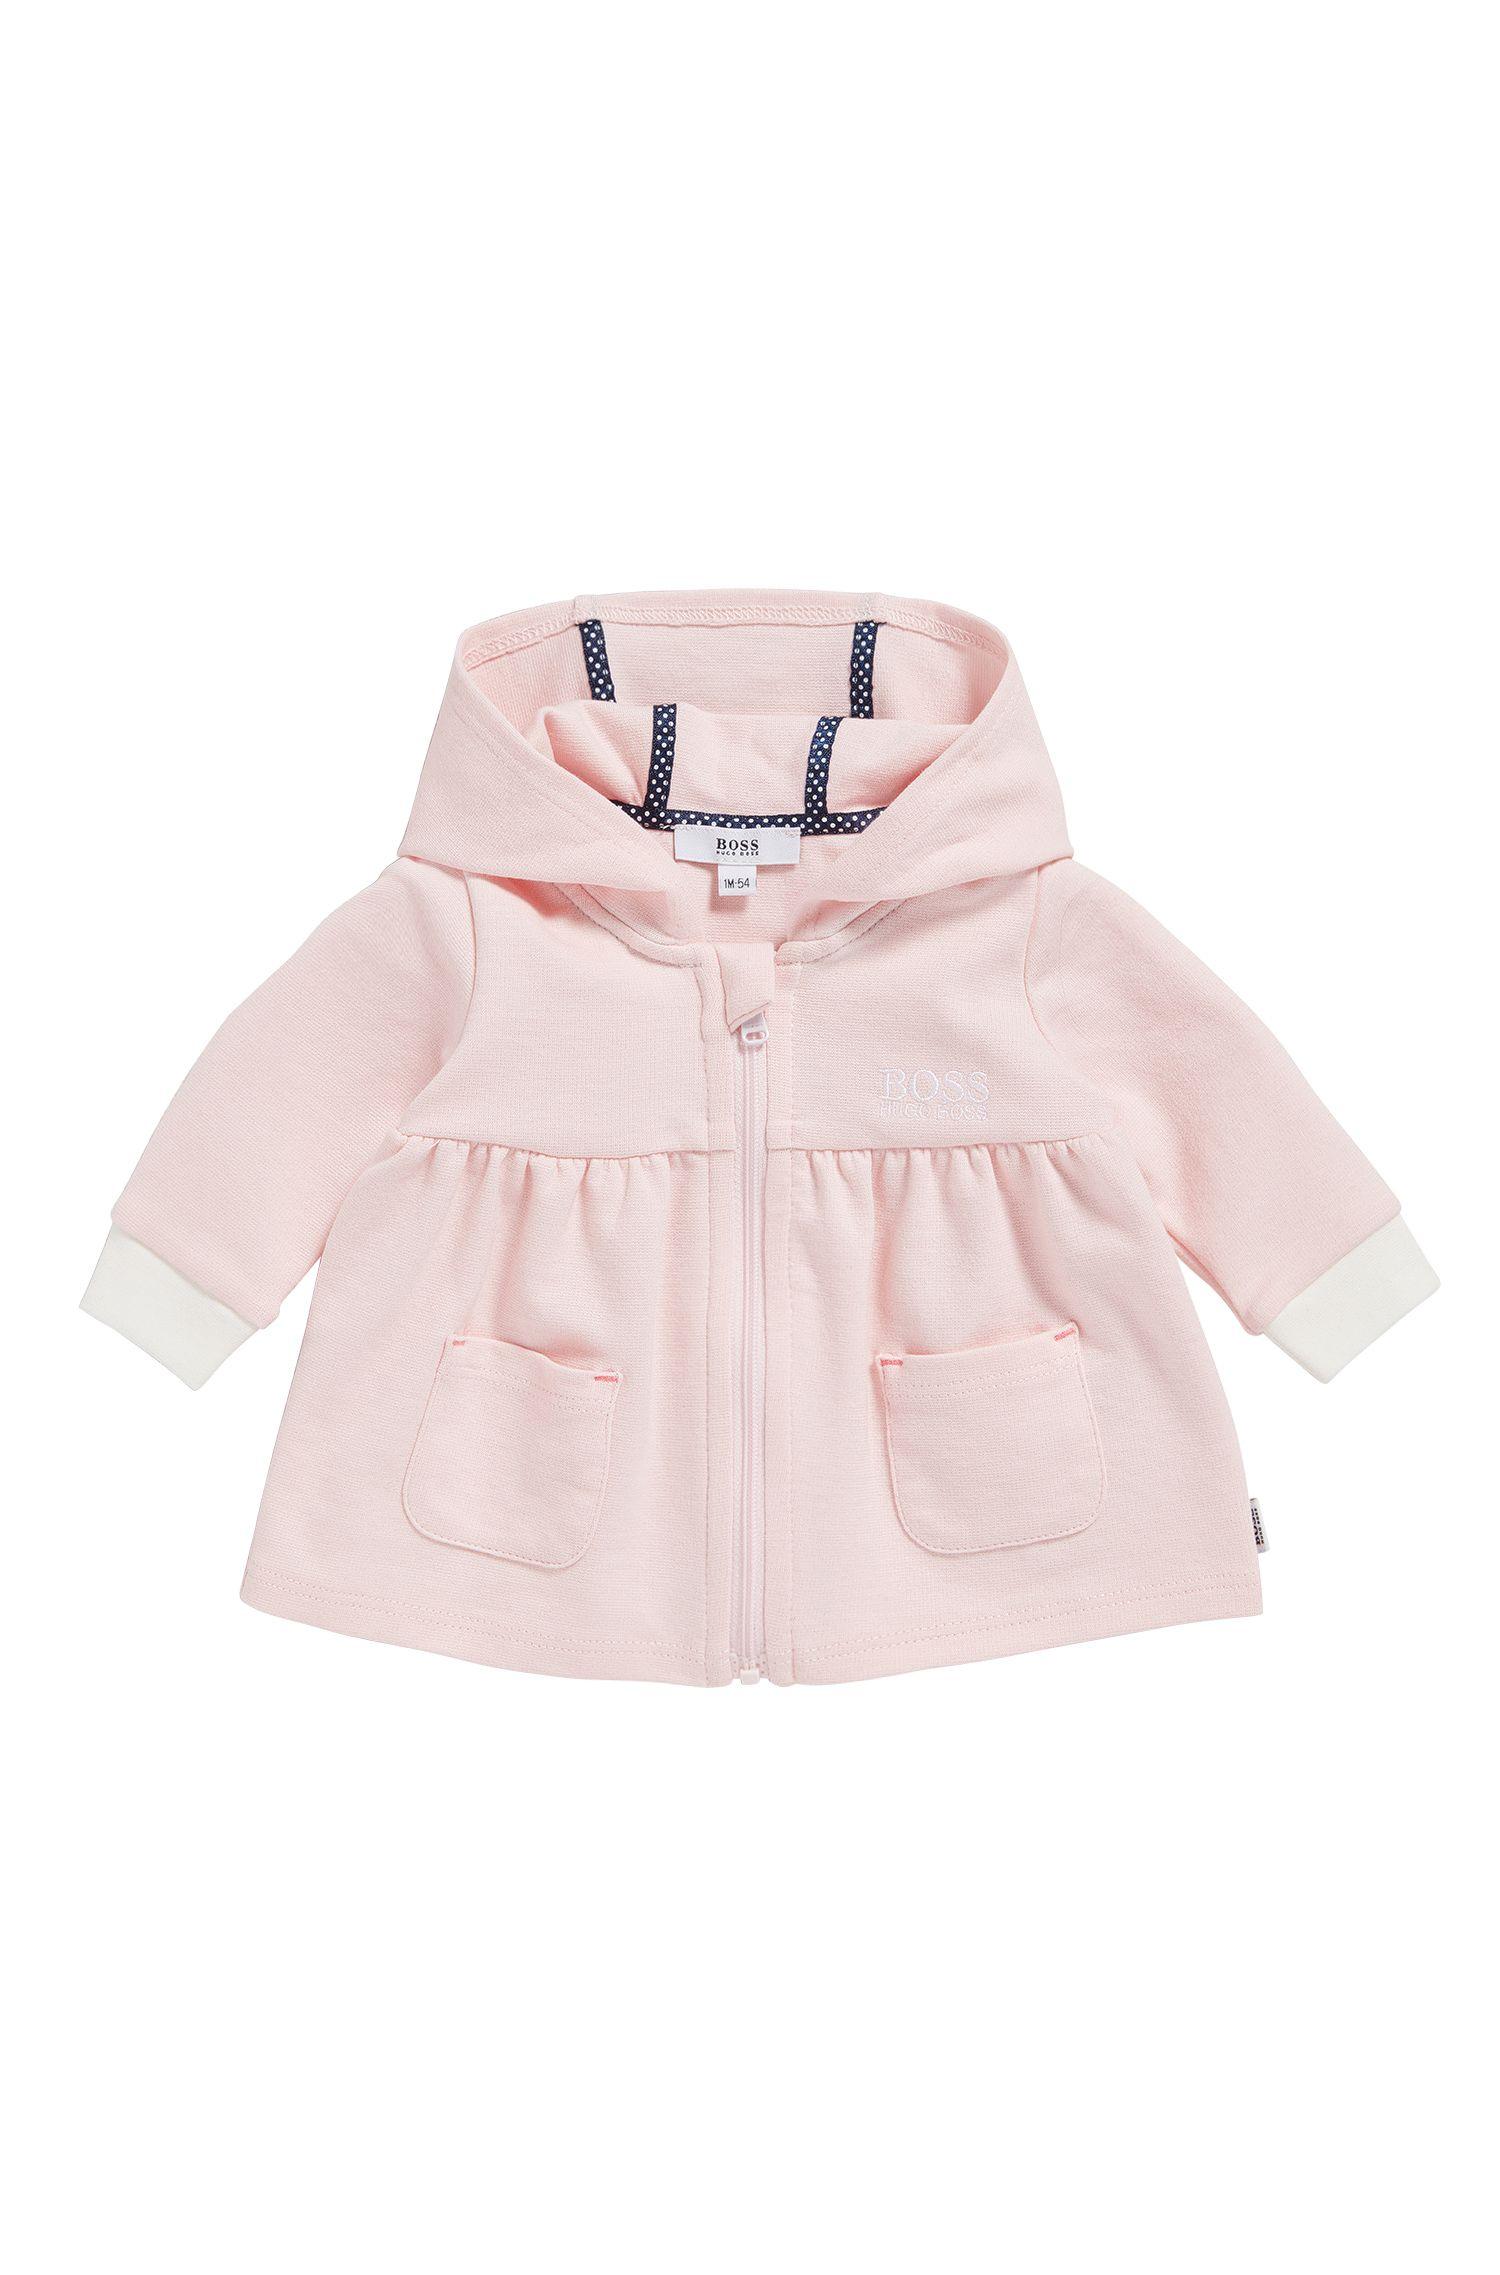 Newborn sweat jacket in stretch cotton blend with modal: 'J95205'